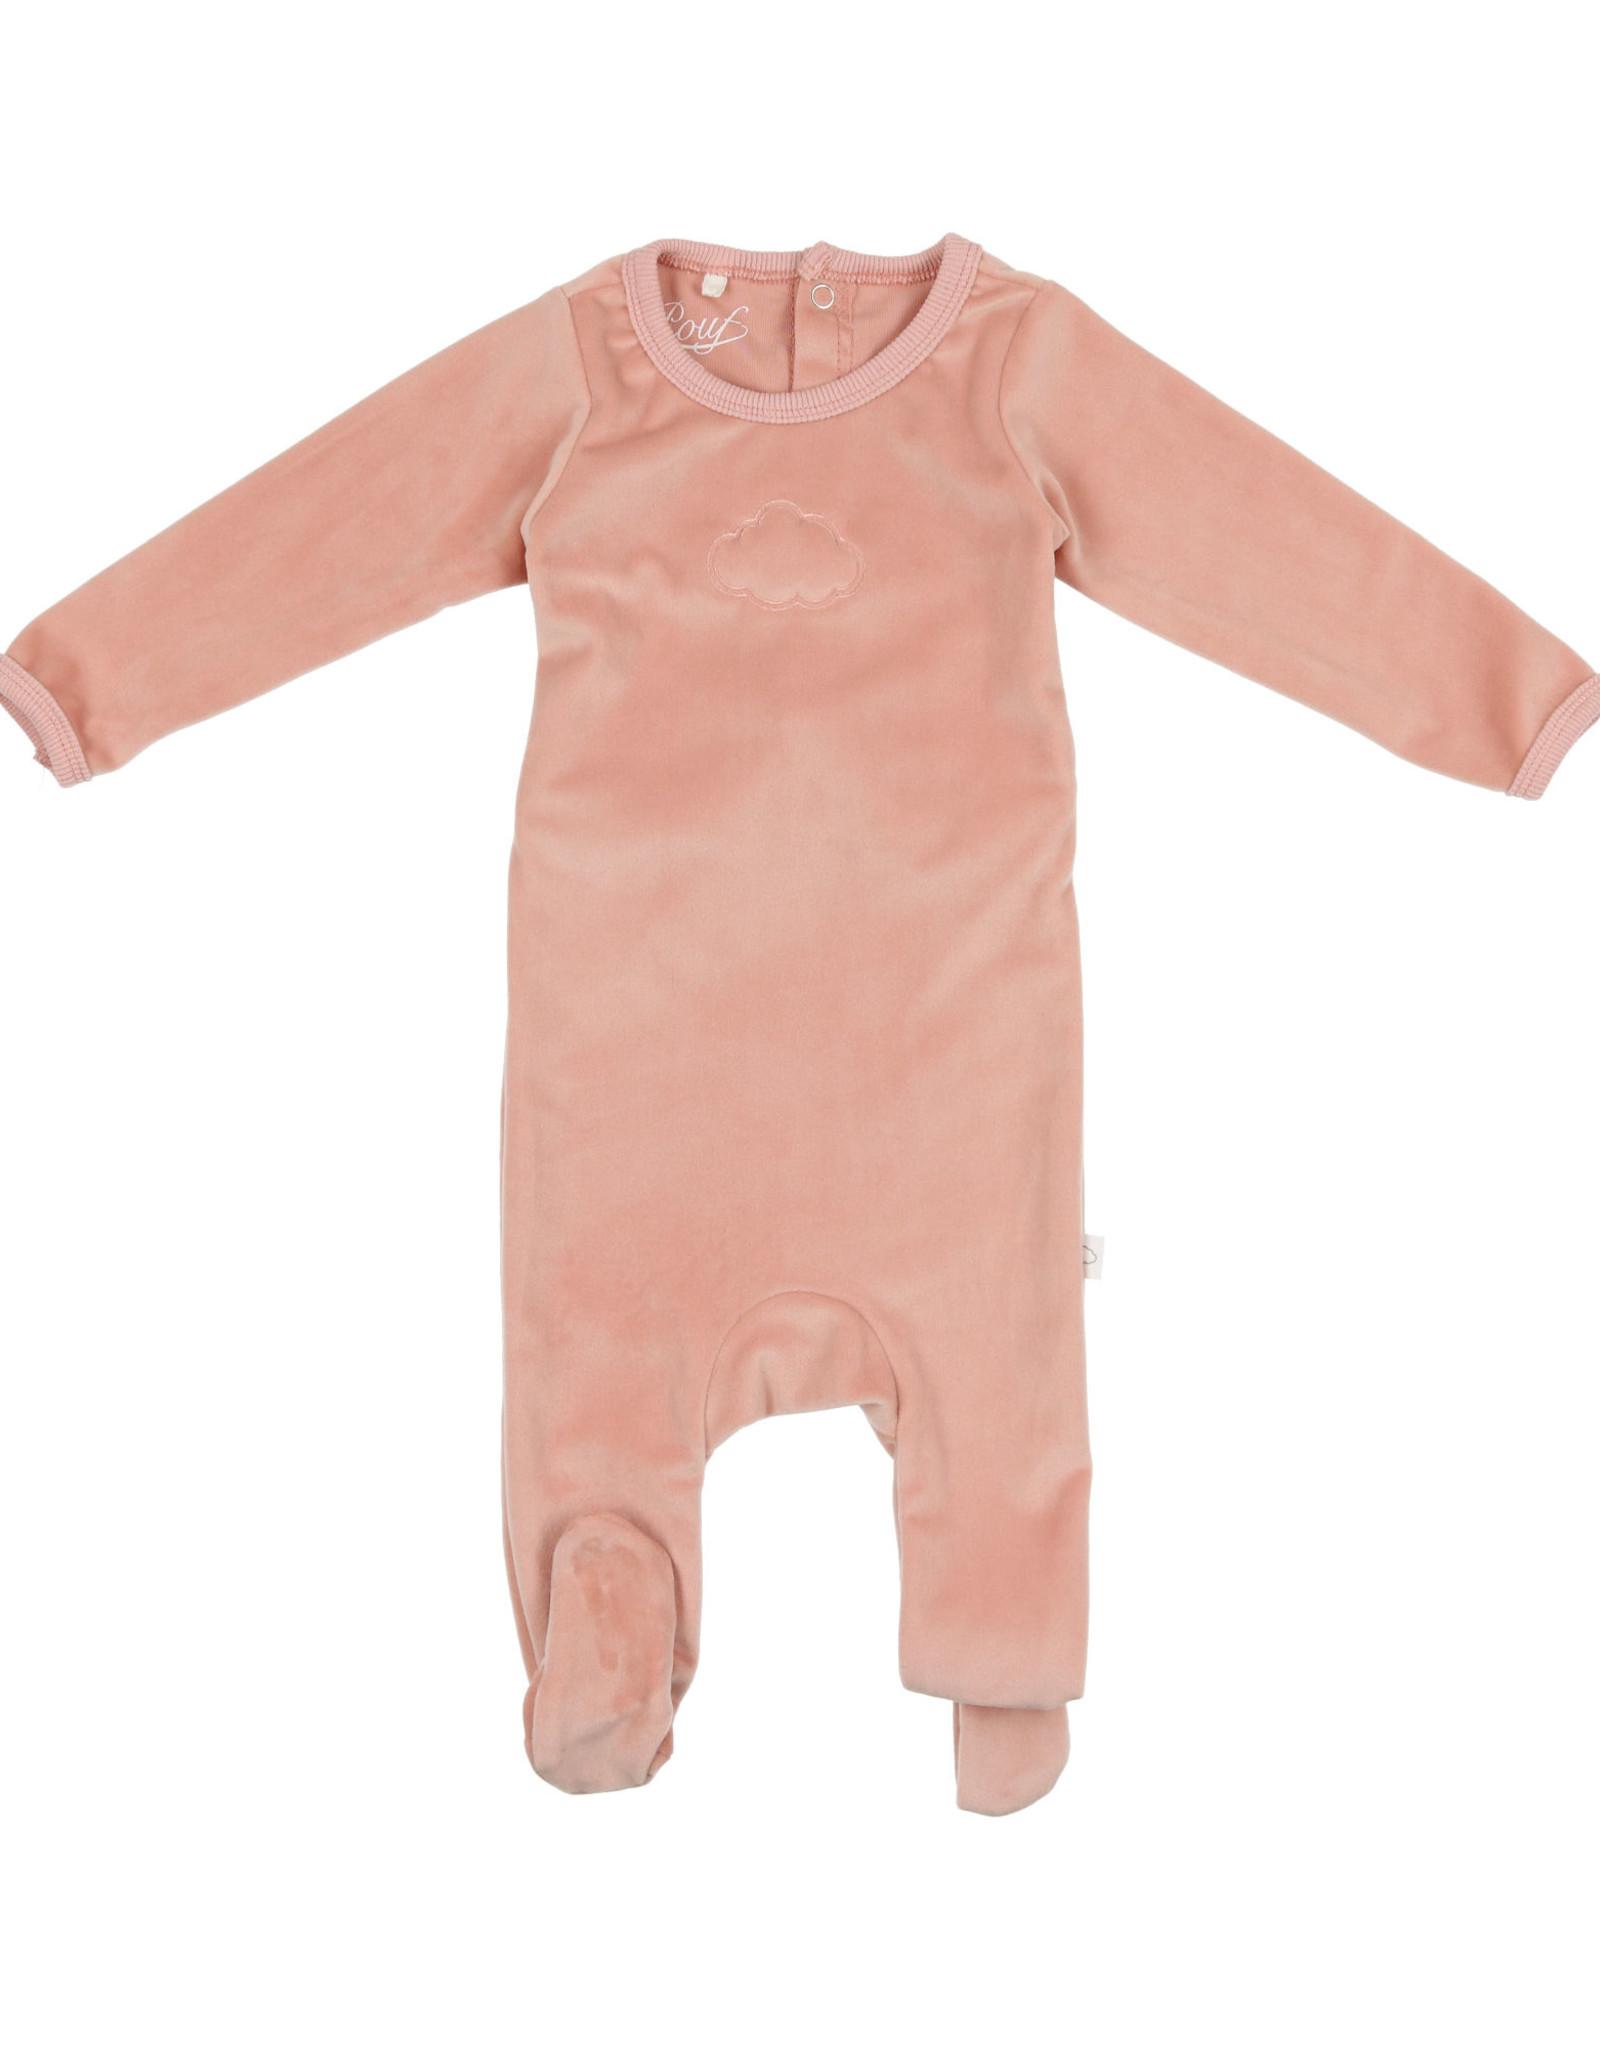 Pouf Pouf Velour Cloud Pajama Footie